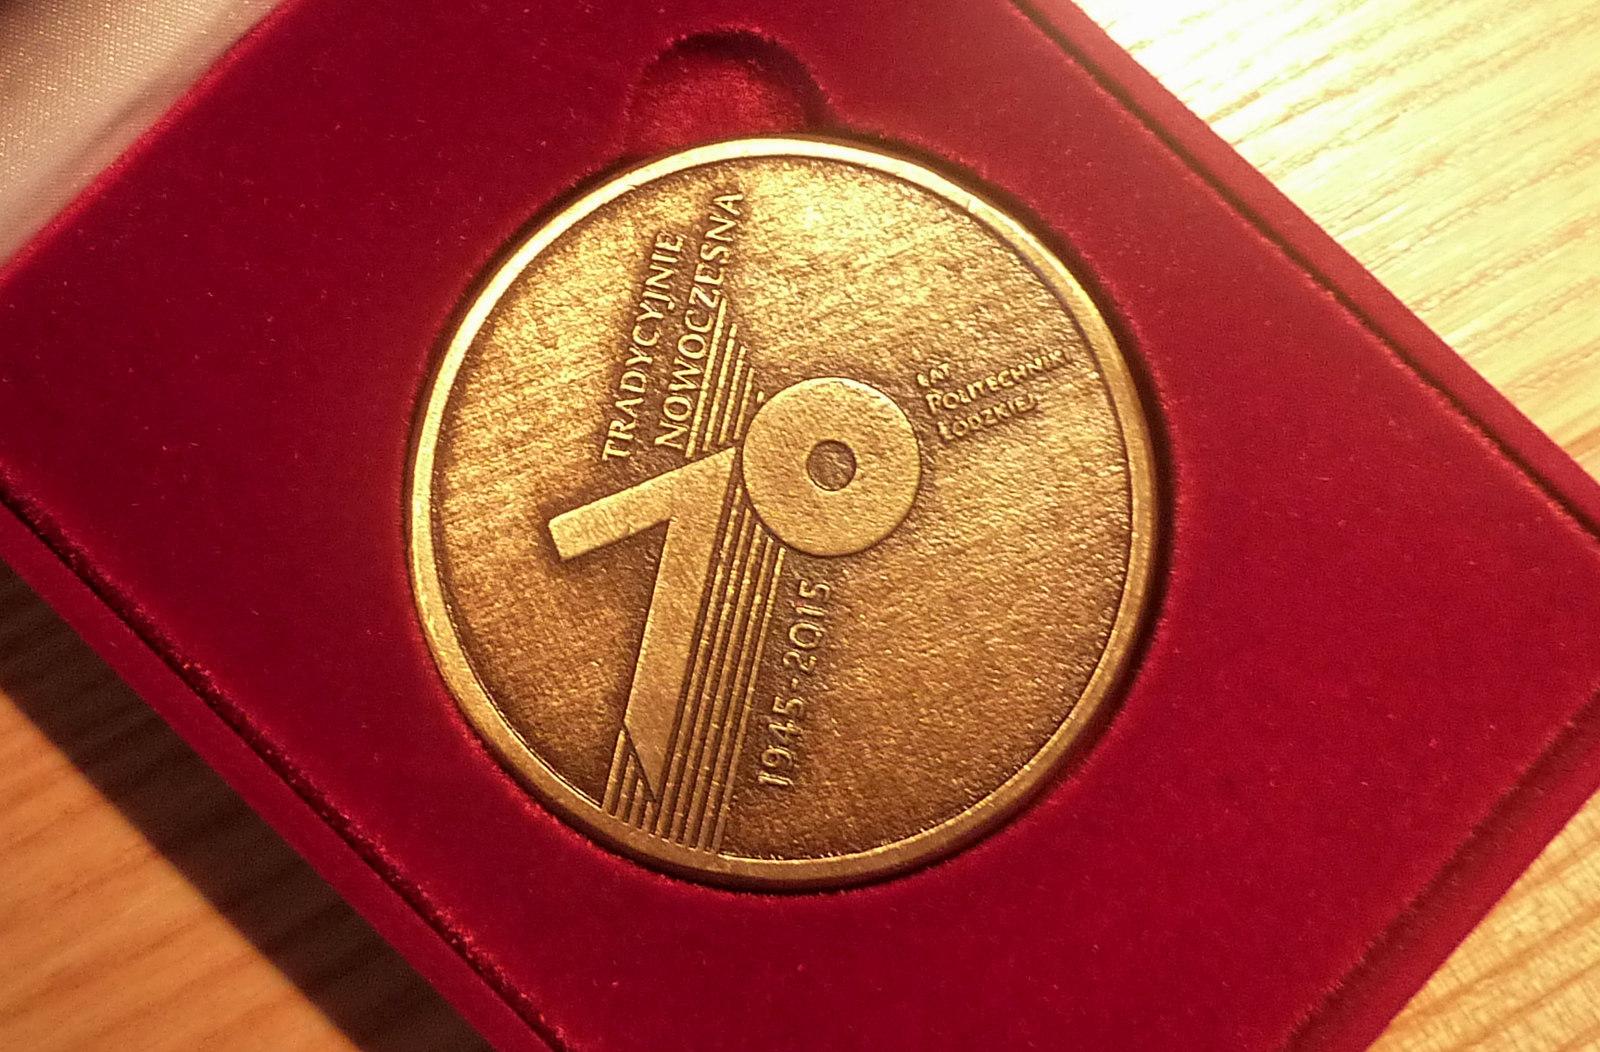 Medale dla PŁ